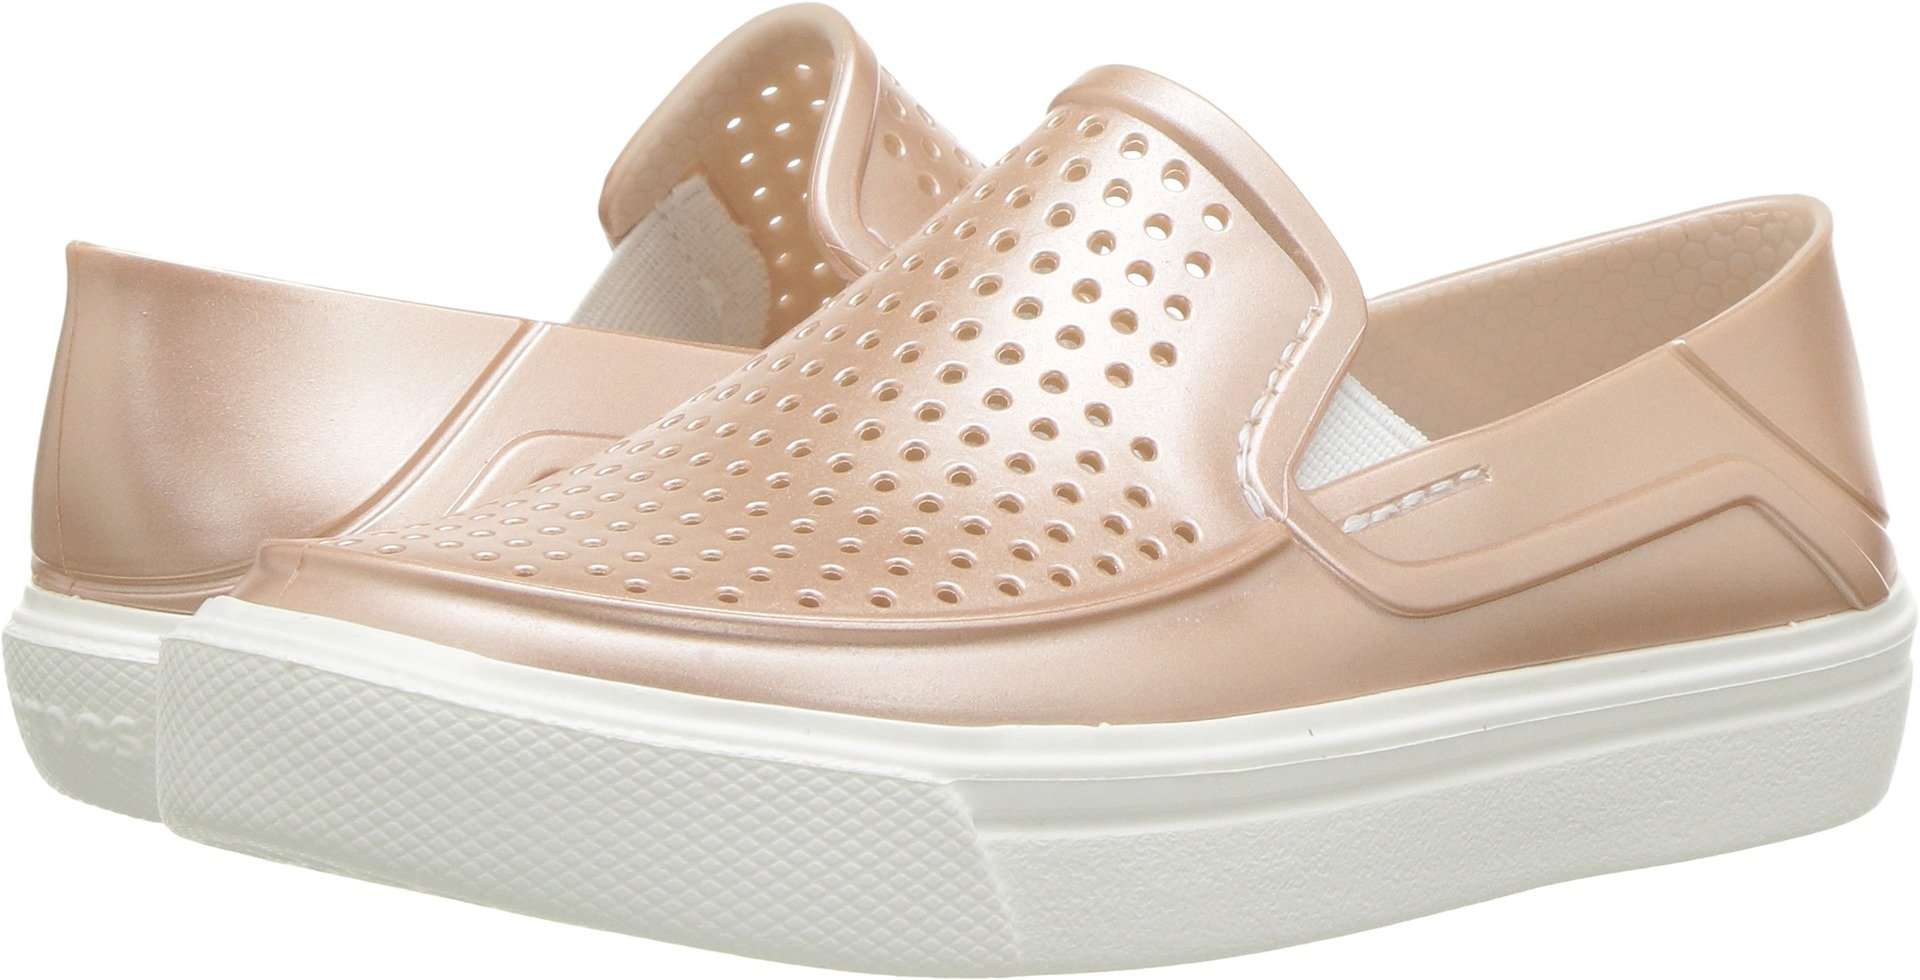 Crocs Girls' Citilane Roka Metallic SLP K Clog, Rose Dust, 2 M US Little Kid